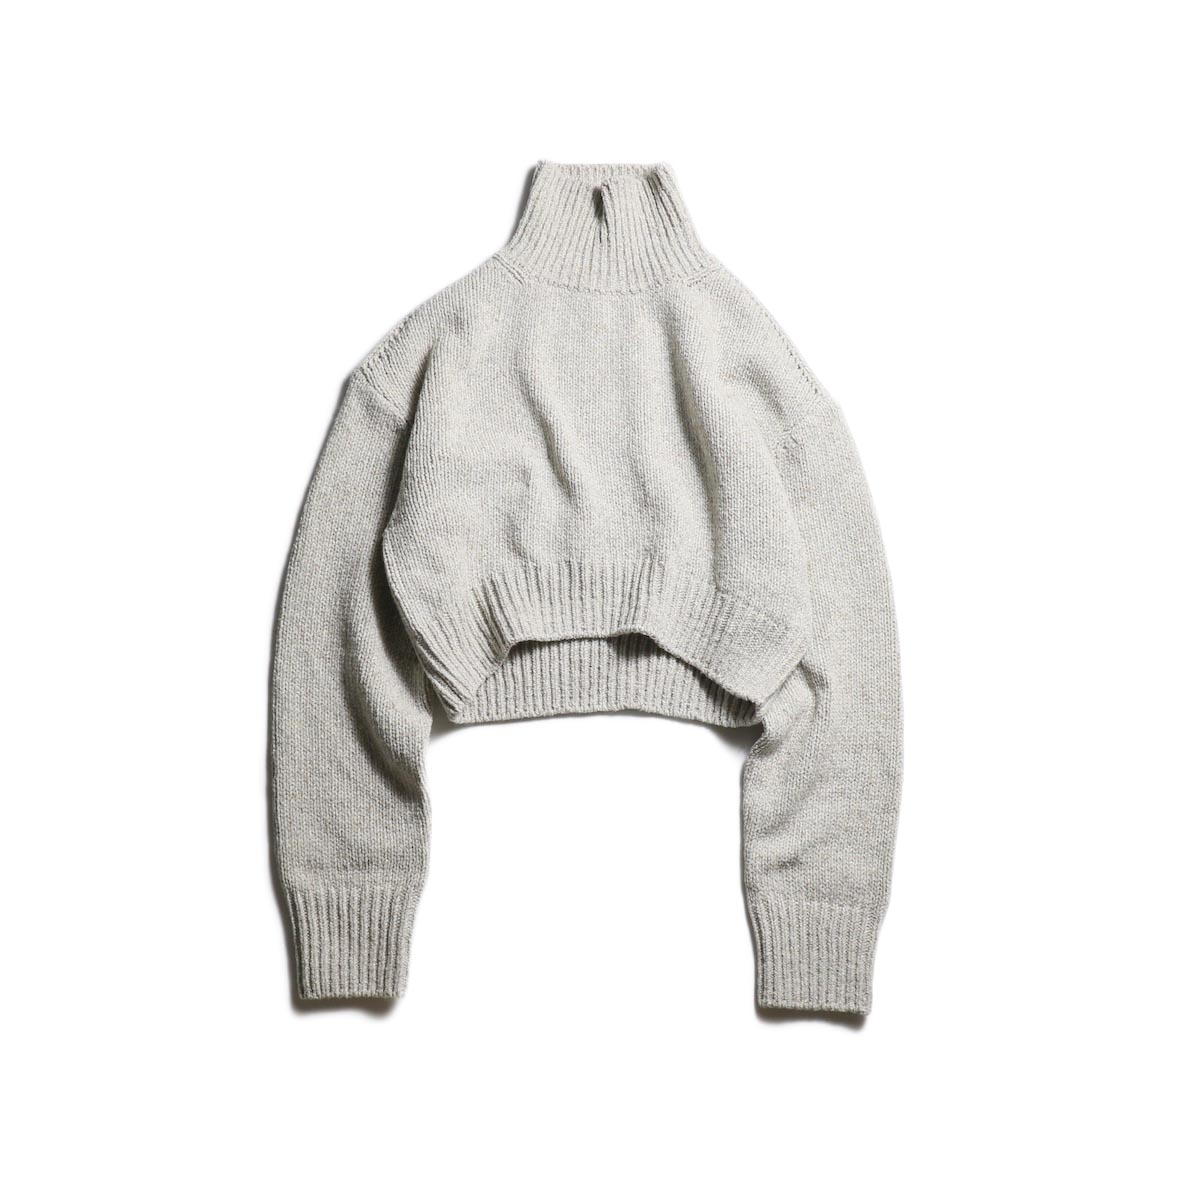 FUMIKA UCHIDA / 3G Cashmere/Silk High Neck Short Sweater (Oatmeal)